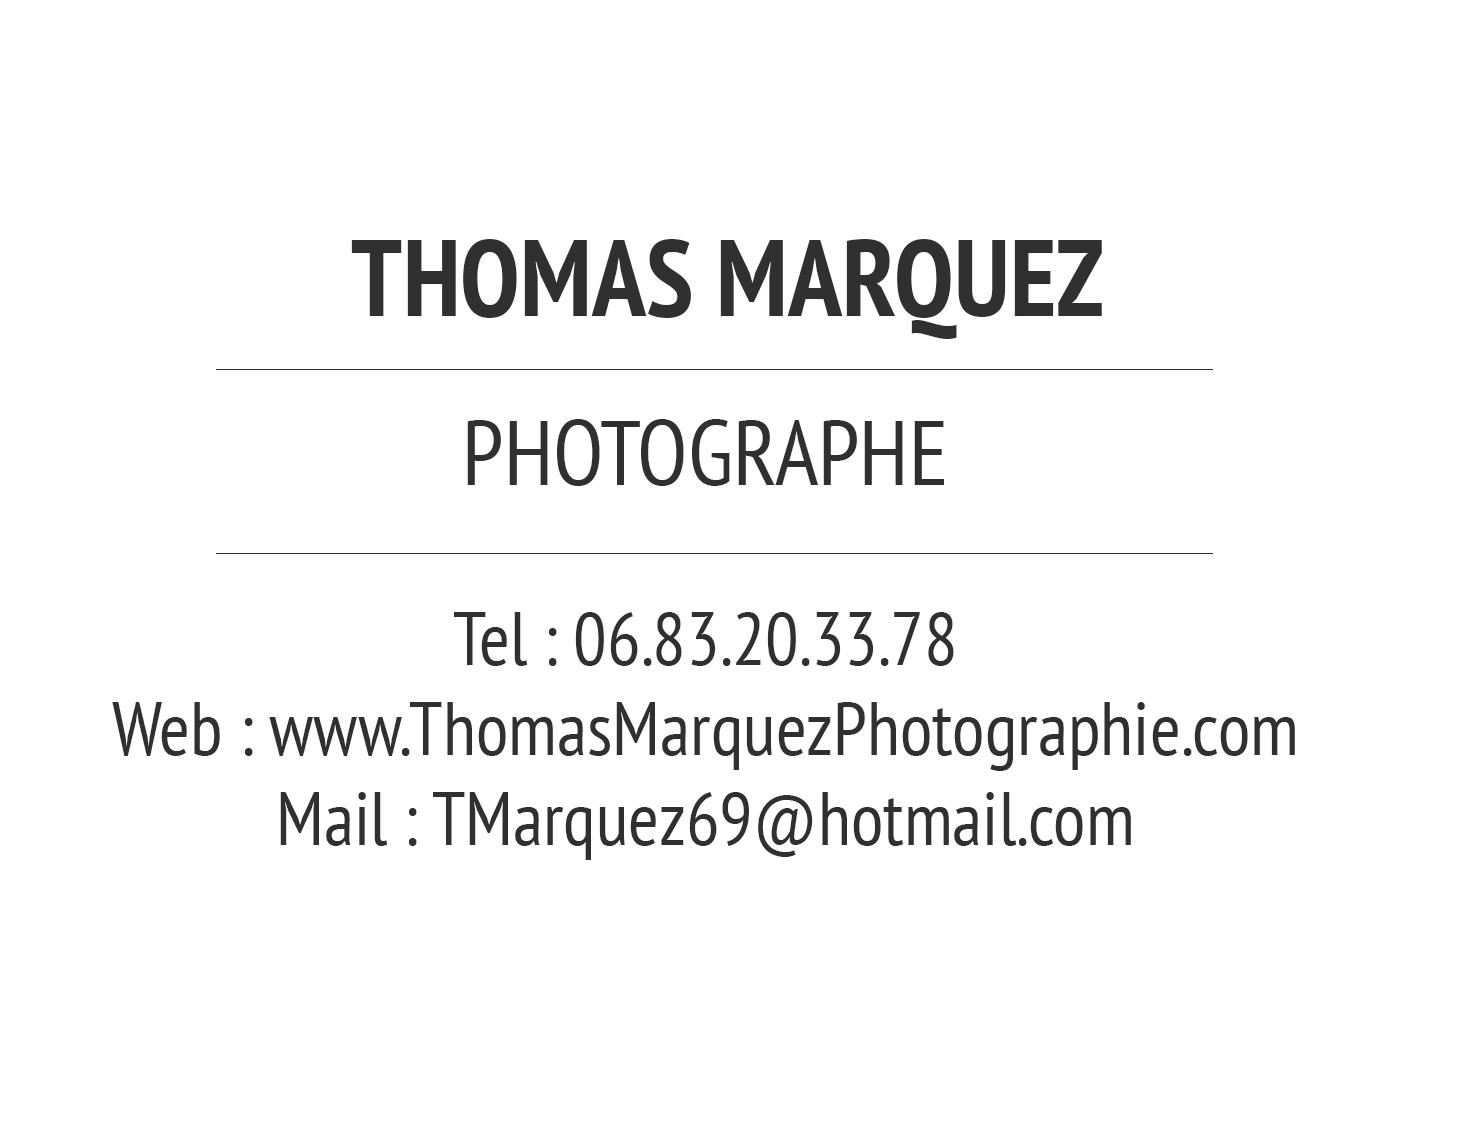 thomas marquez.jpg